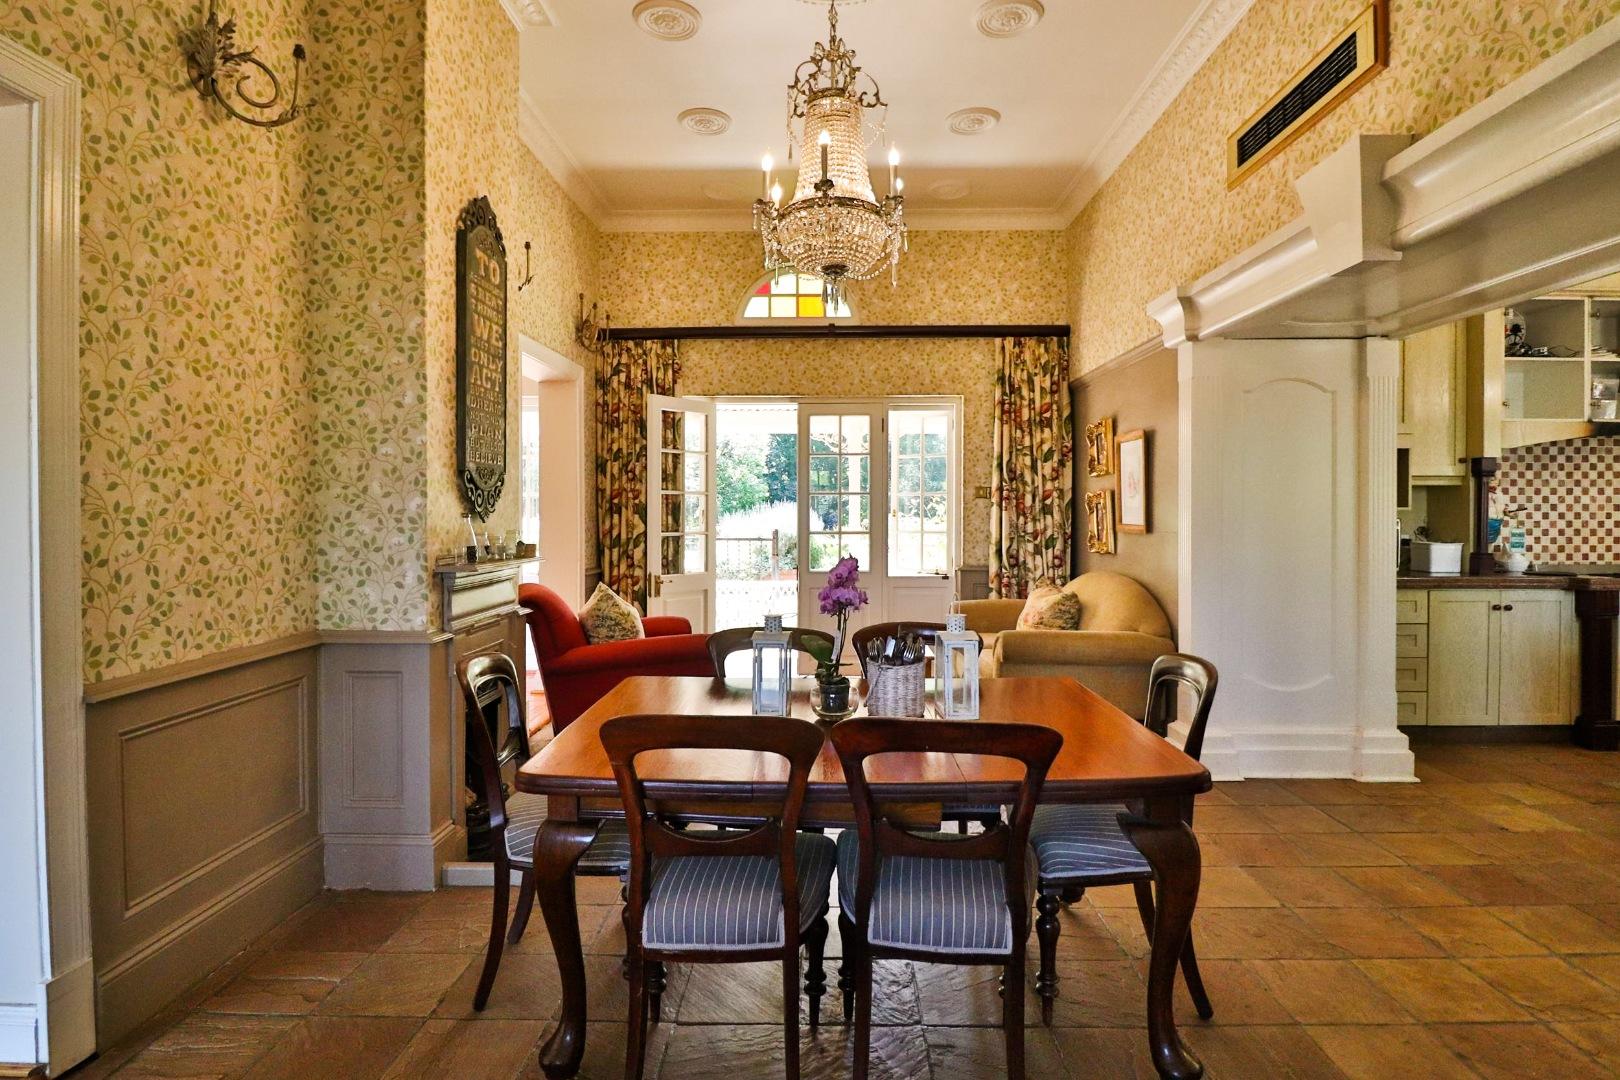 6 Bedroom House For Sale in Blackridge